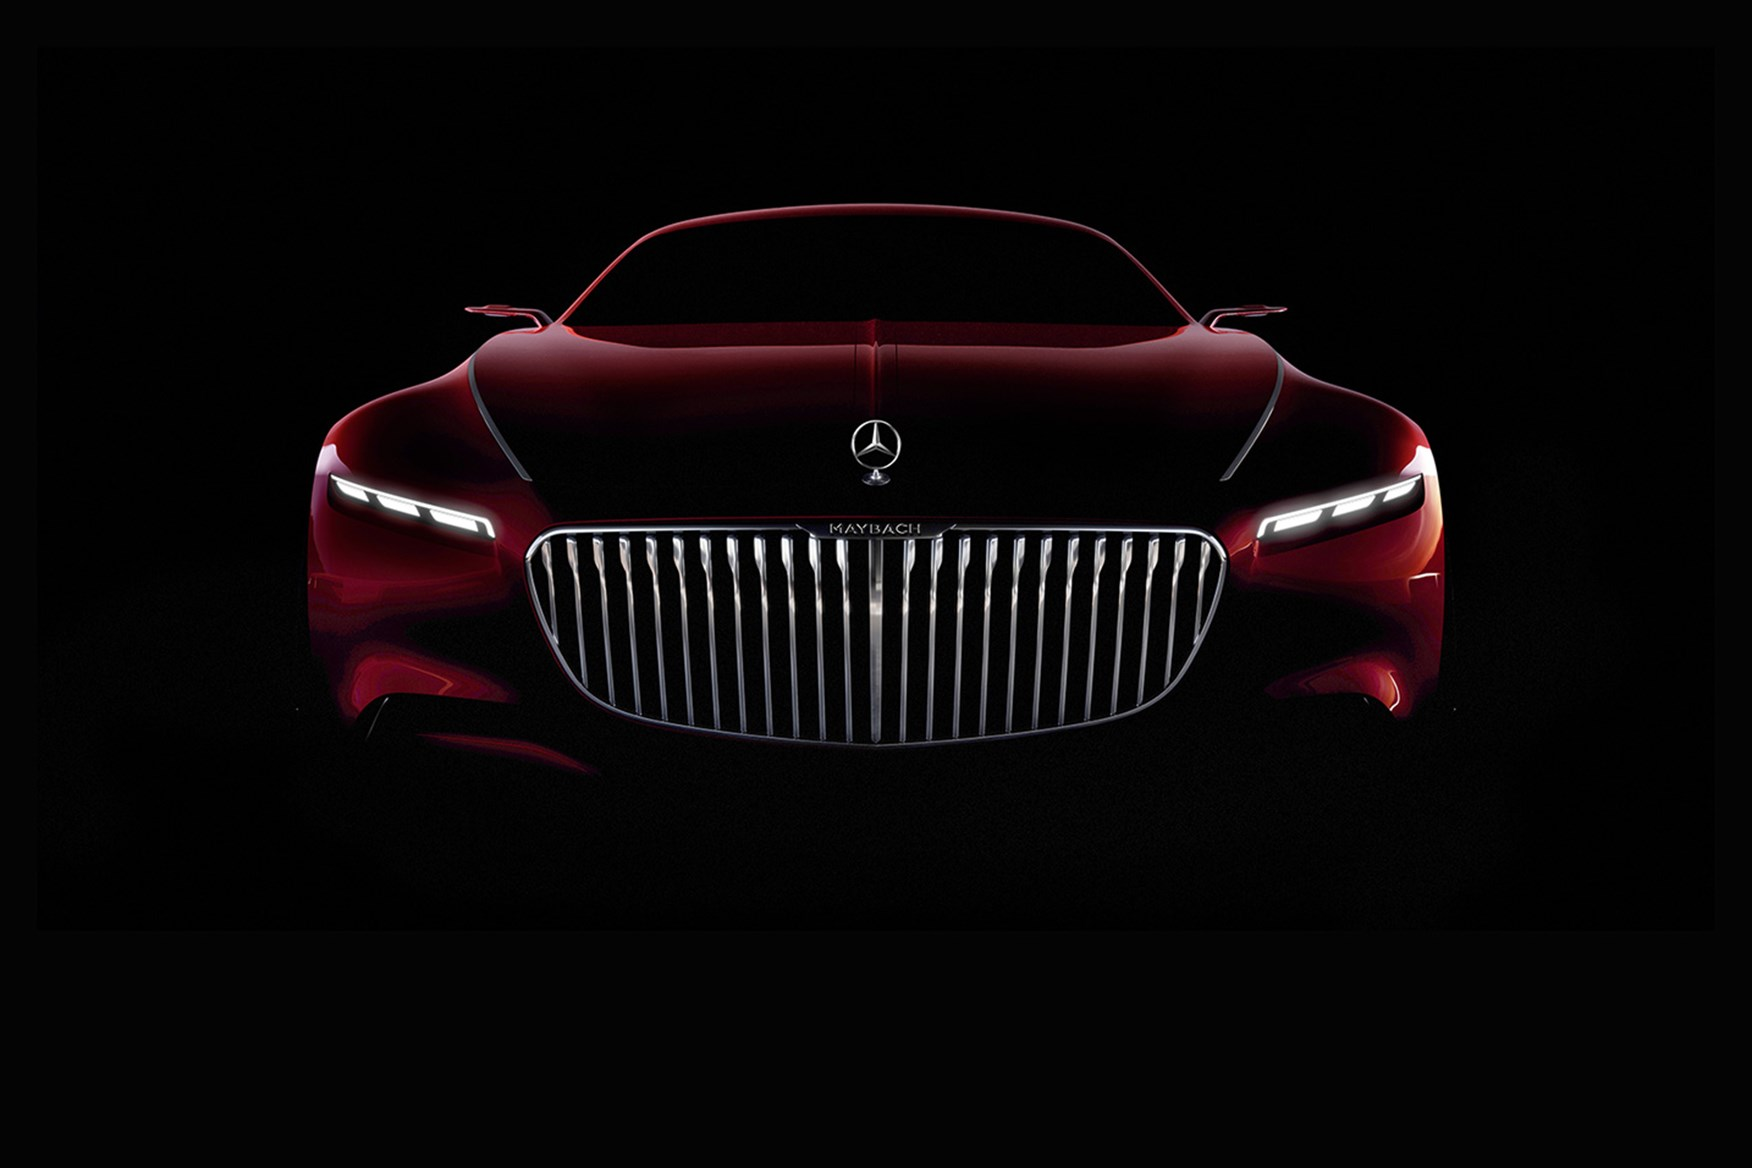 Vehicle Parts & Accessories Gold Lustrous Surface Helpful Automobile Club Monaco Car Grille Badge